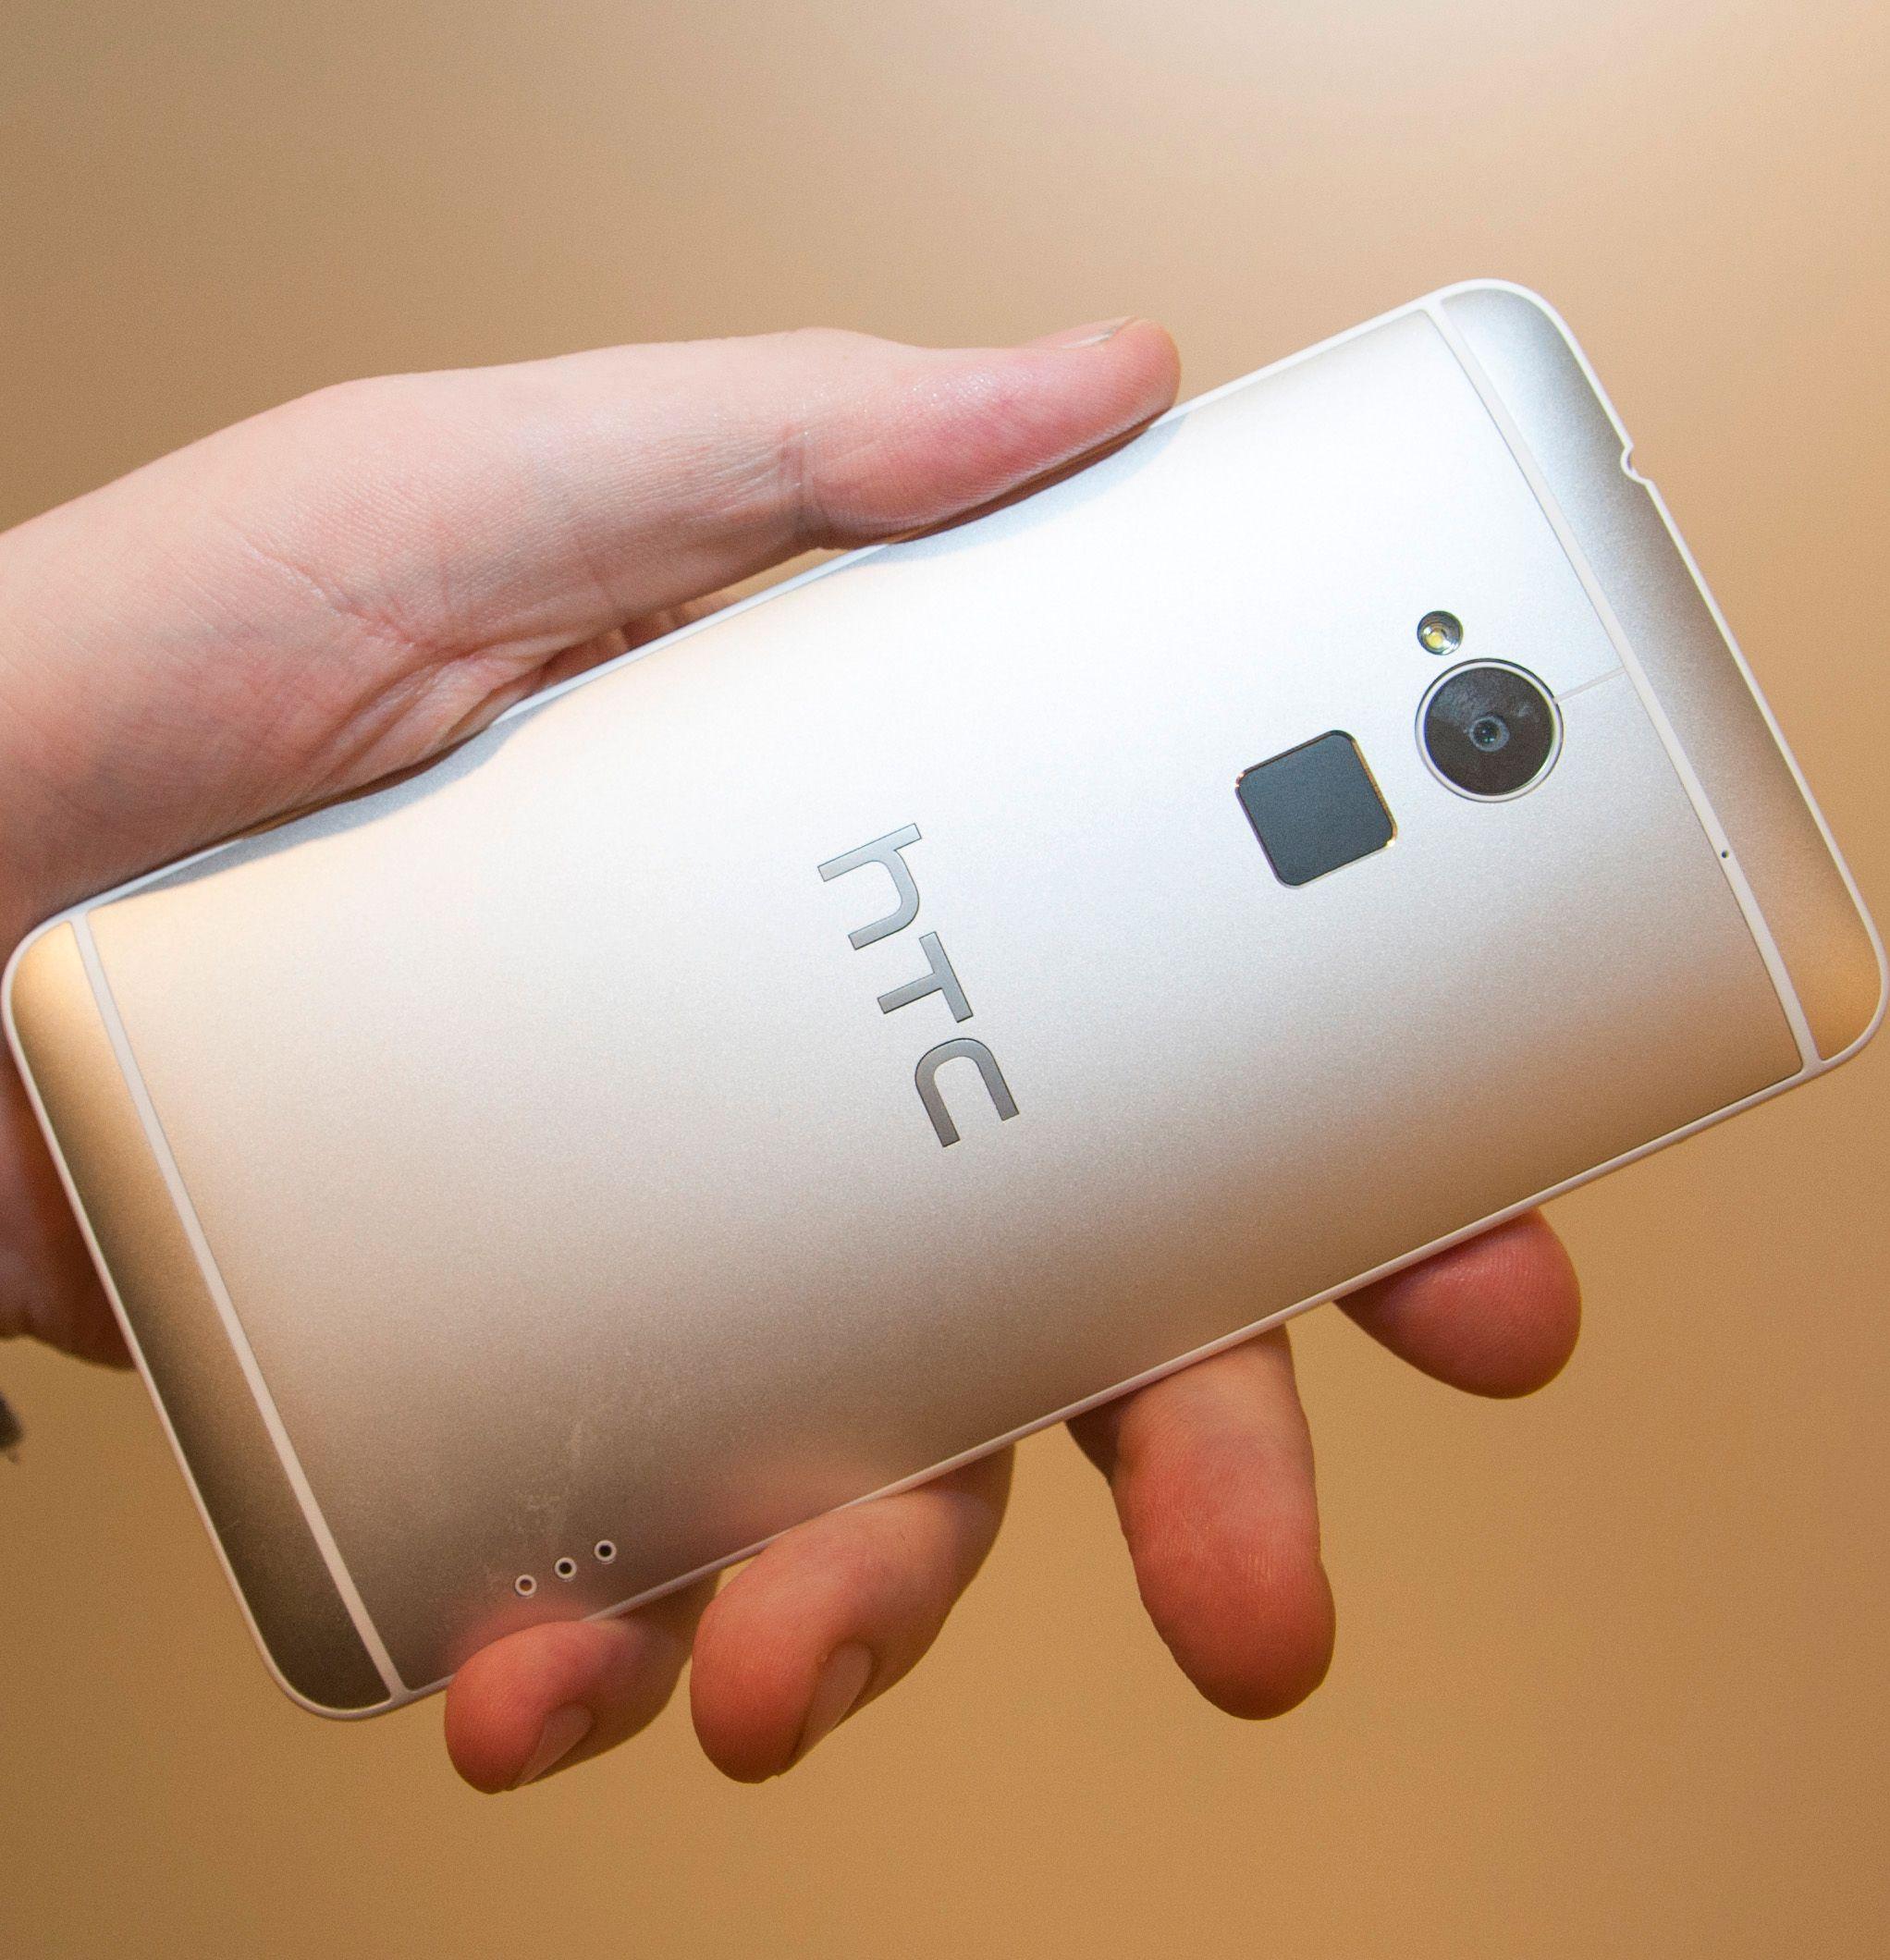 Slik ser baksiden på HTC One Max ut.Foto: Finn Jarle Kvalheim, Amobil.no